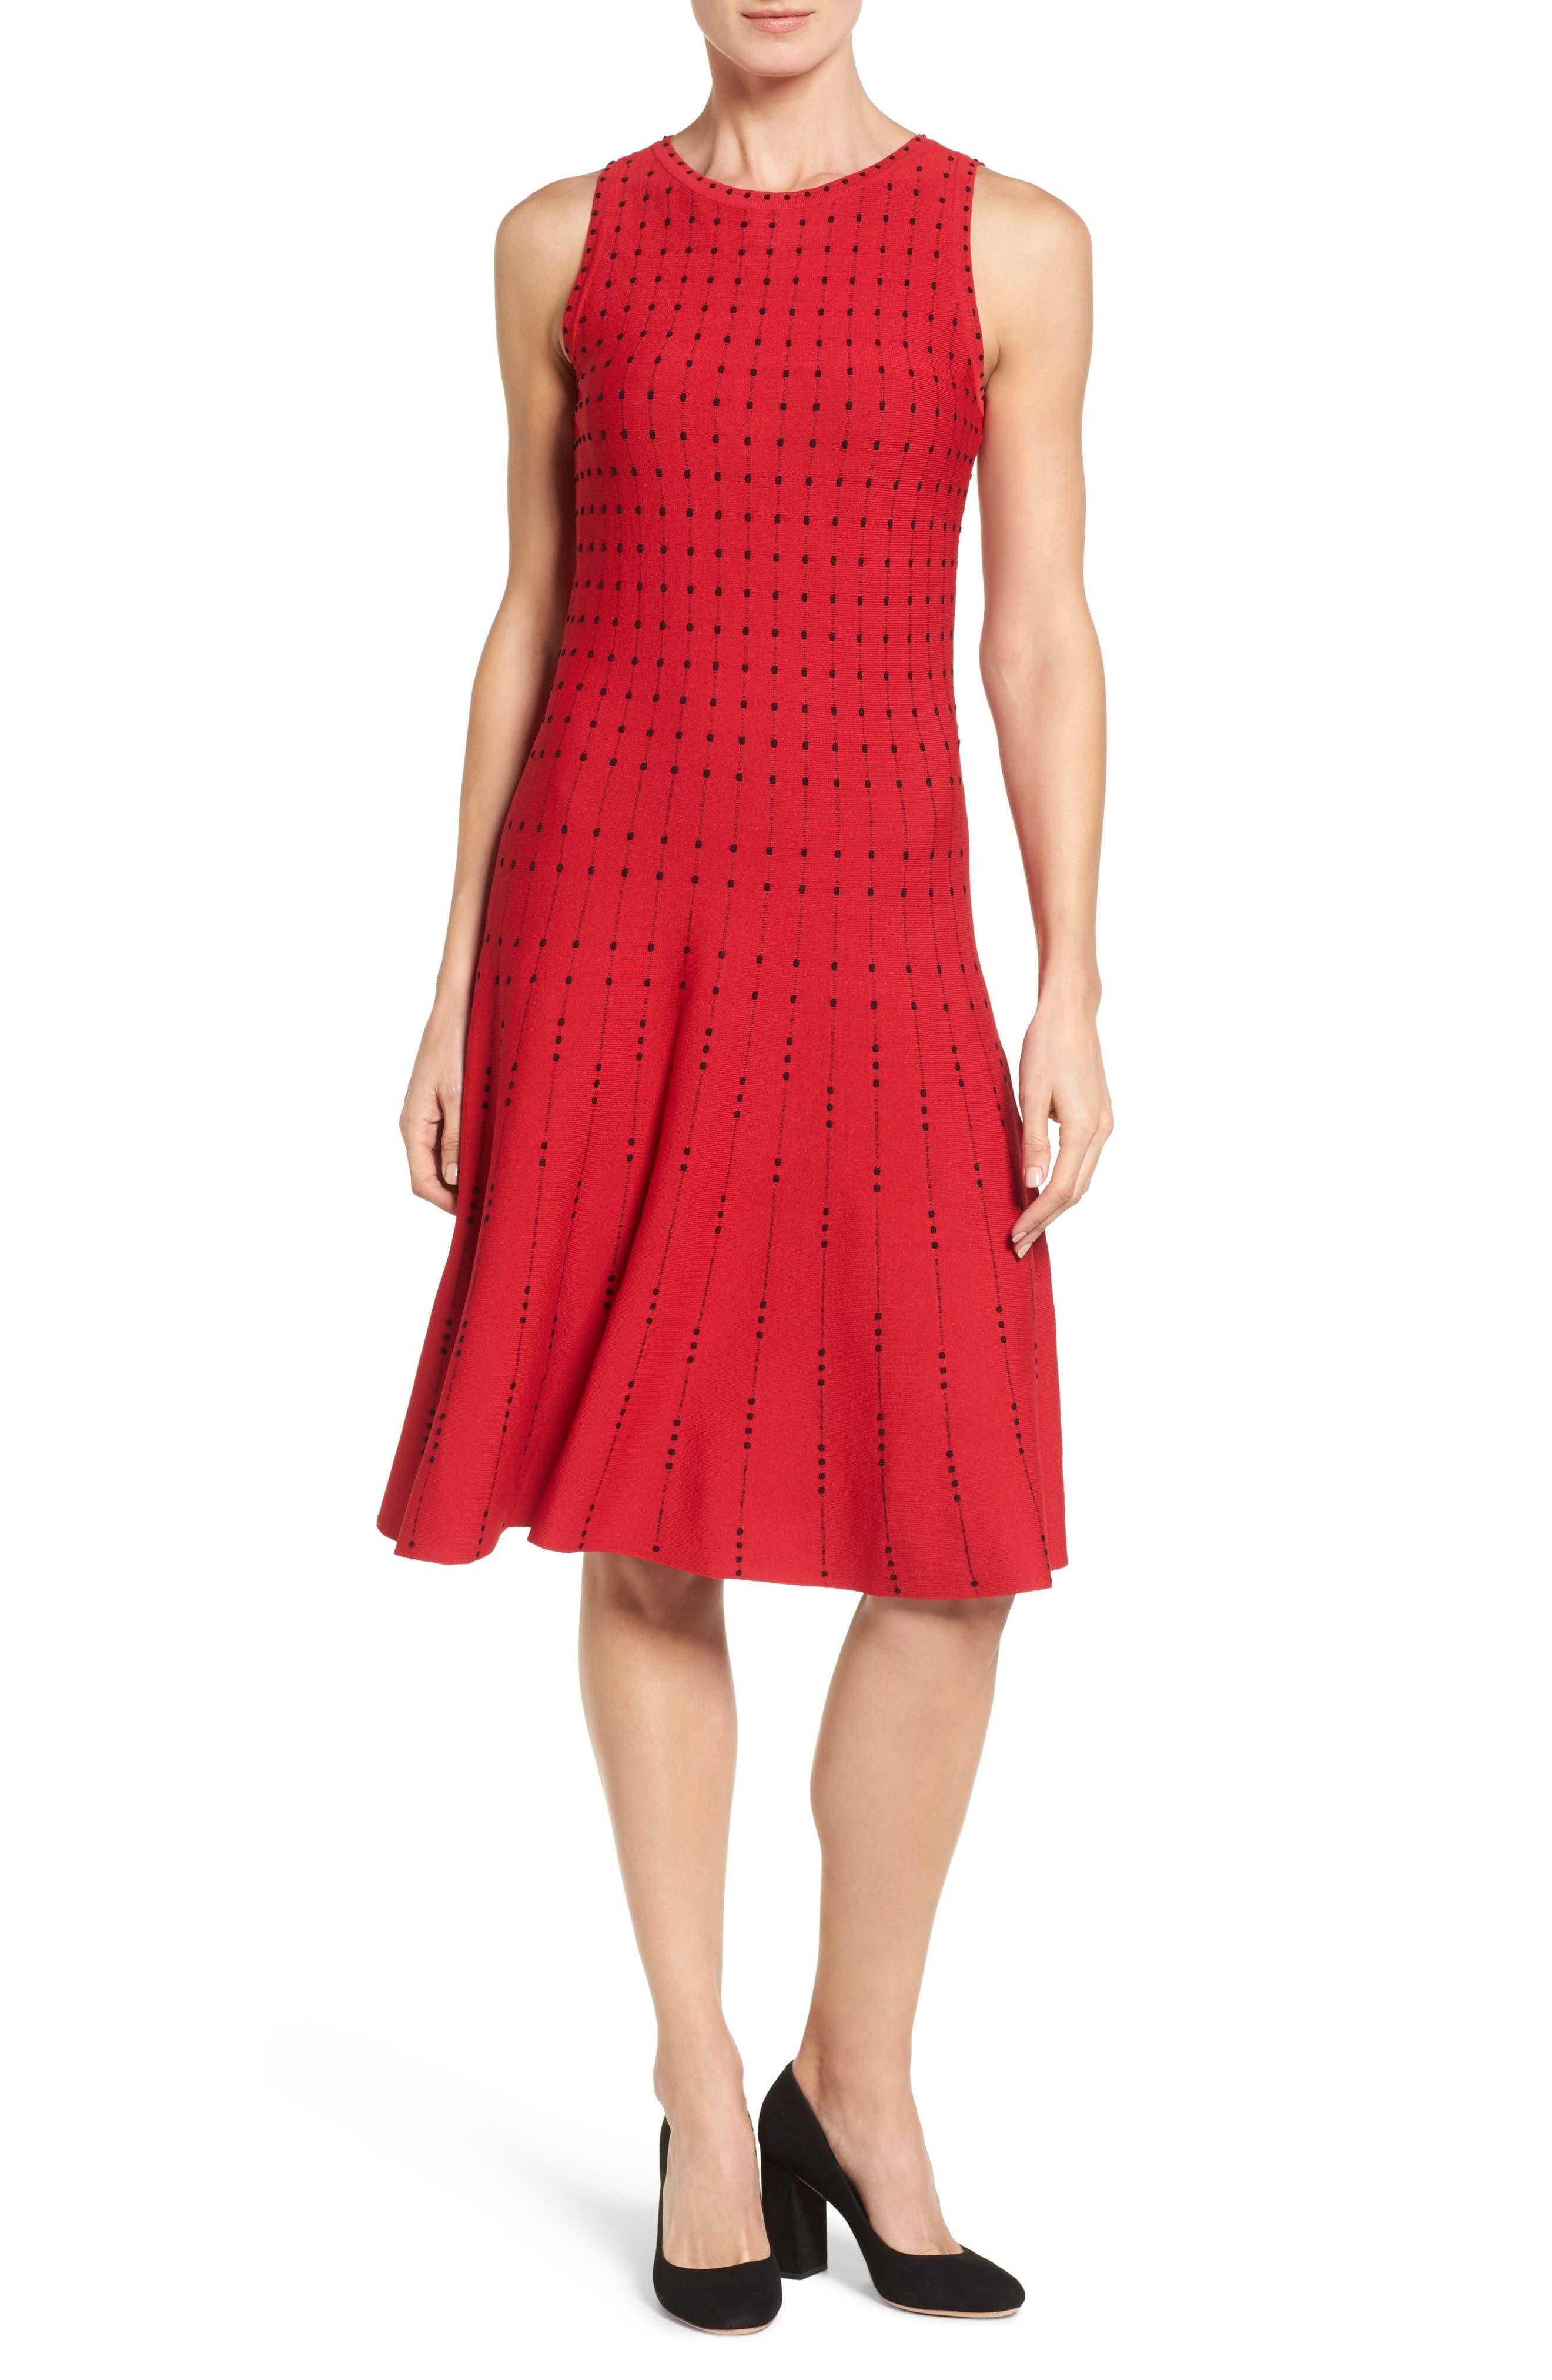 Alternate Image 1 Selected - NIC+ZOE Iceland Twirl Dress (Regular & Petite)